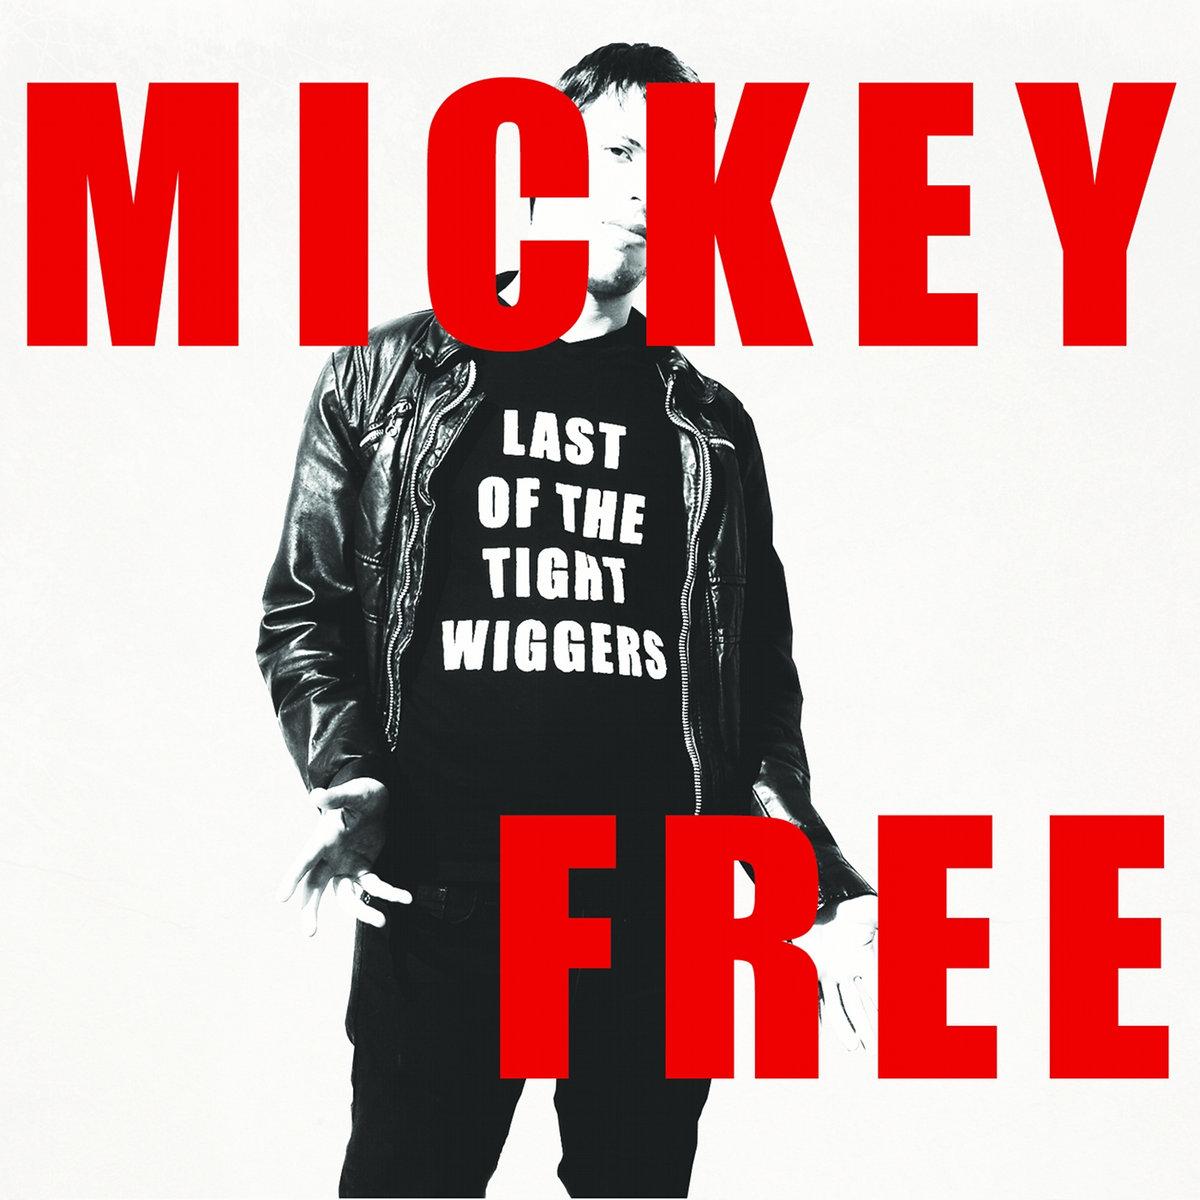 Mickey Free - LOTTW (2011)